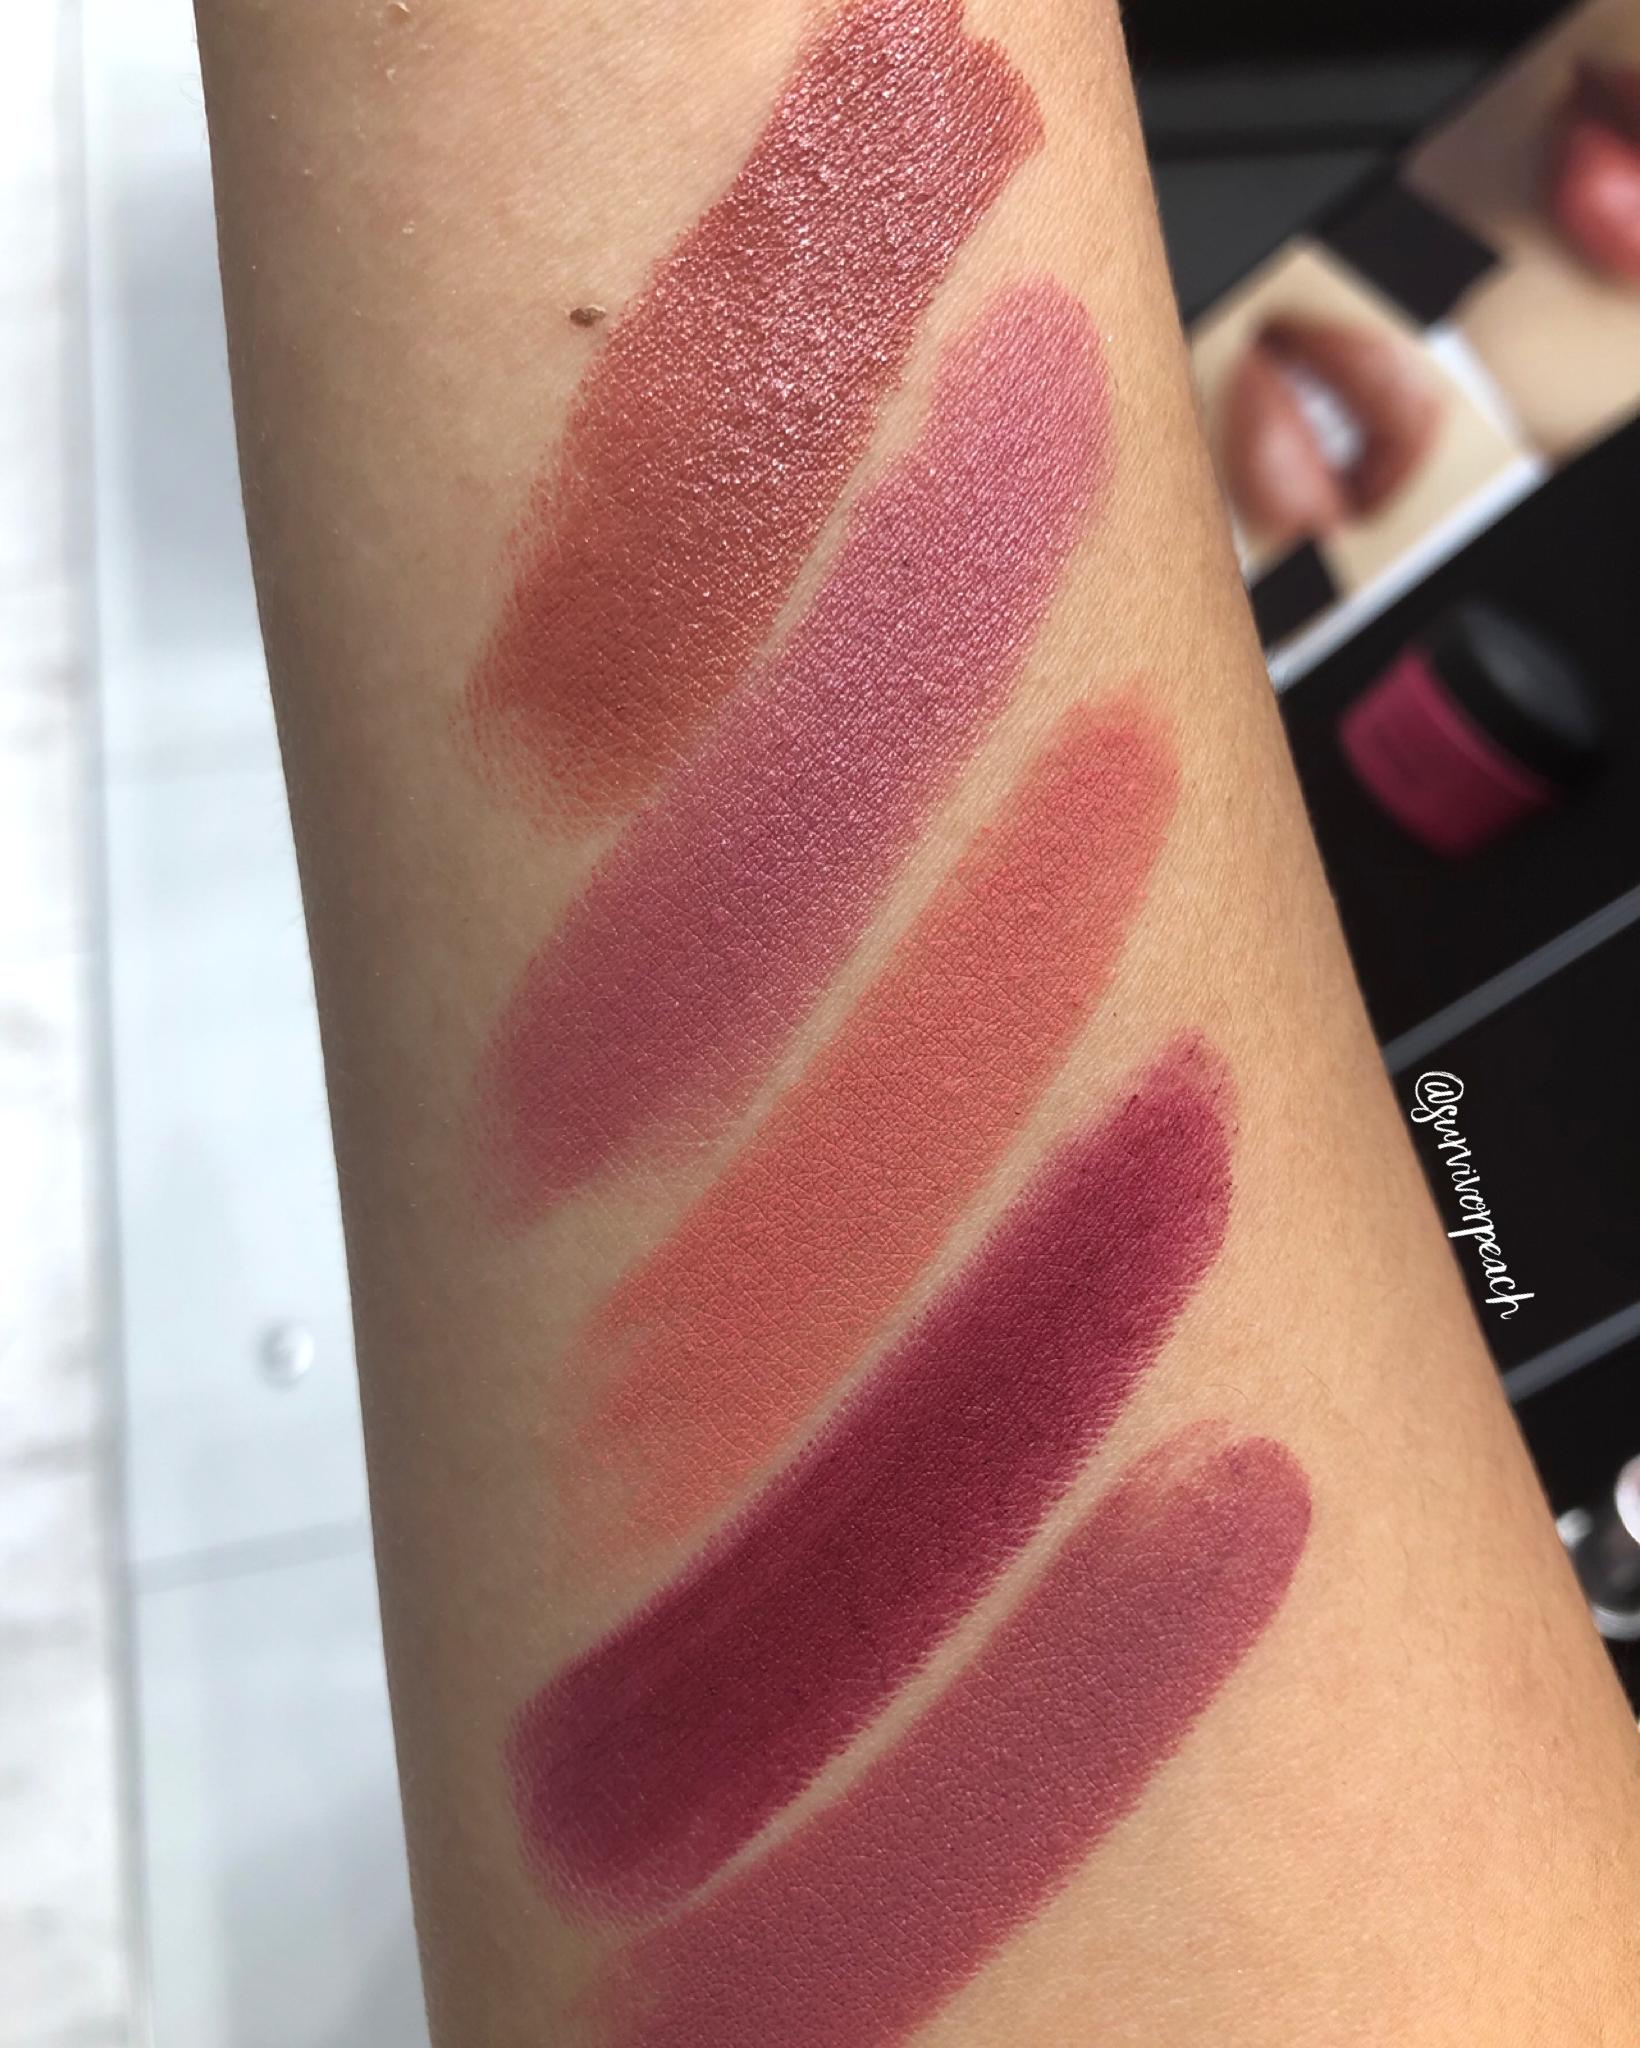 Mac Naturally You Lipstick swatches - Runway Hit, Brave, Smoked Almond, Mehr, Burning Love